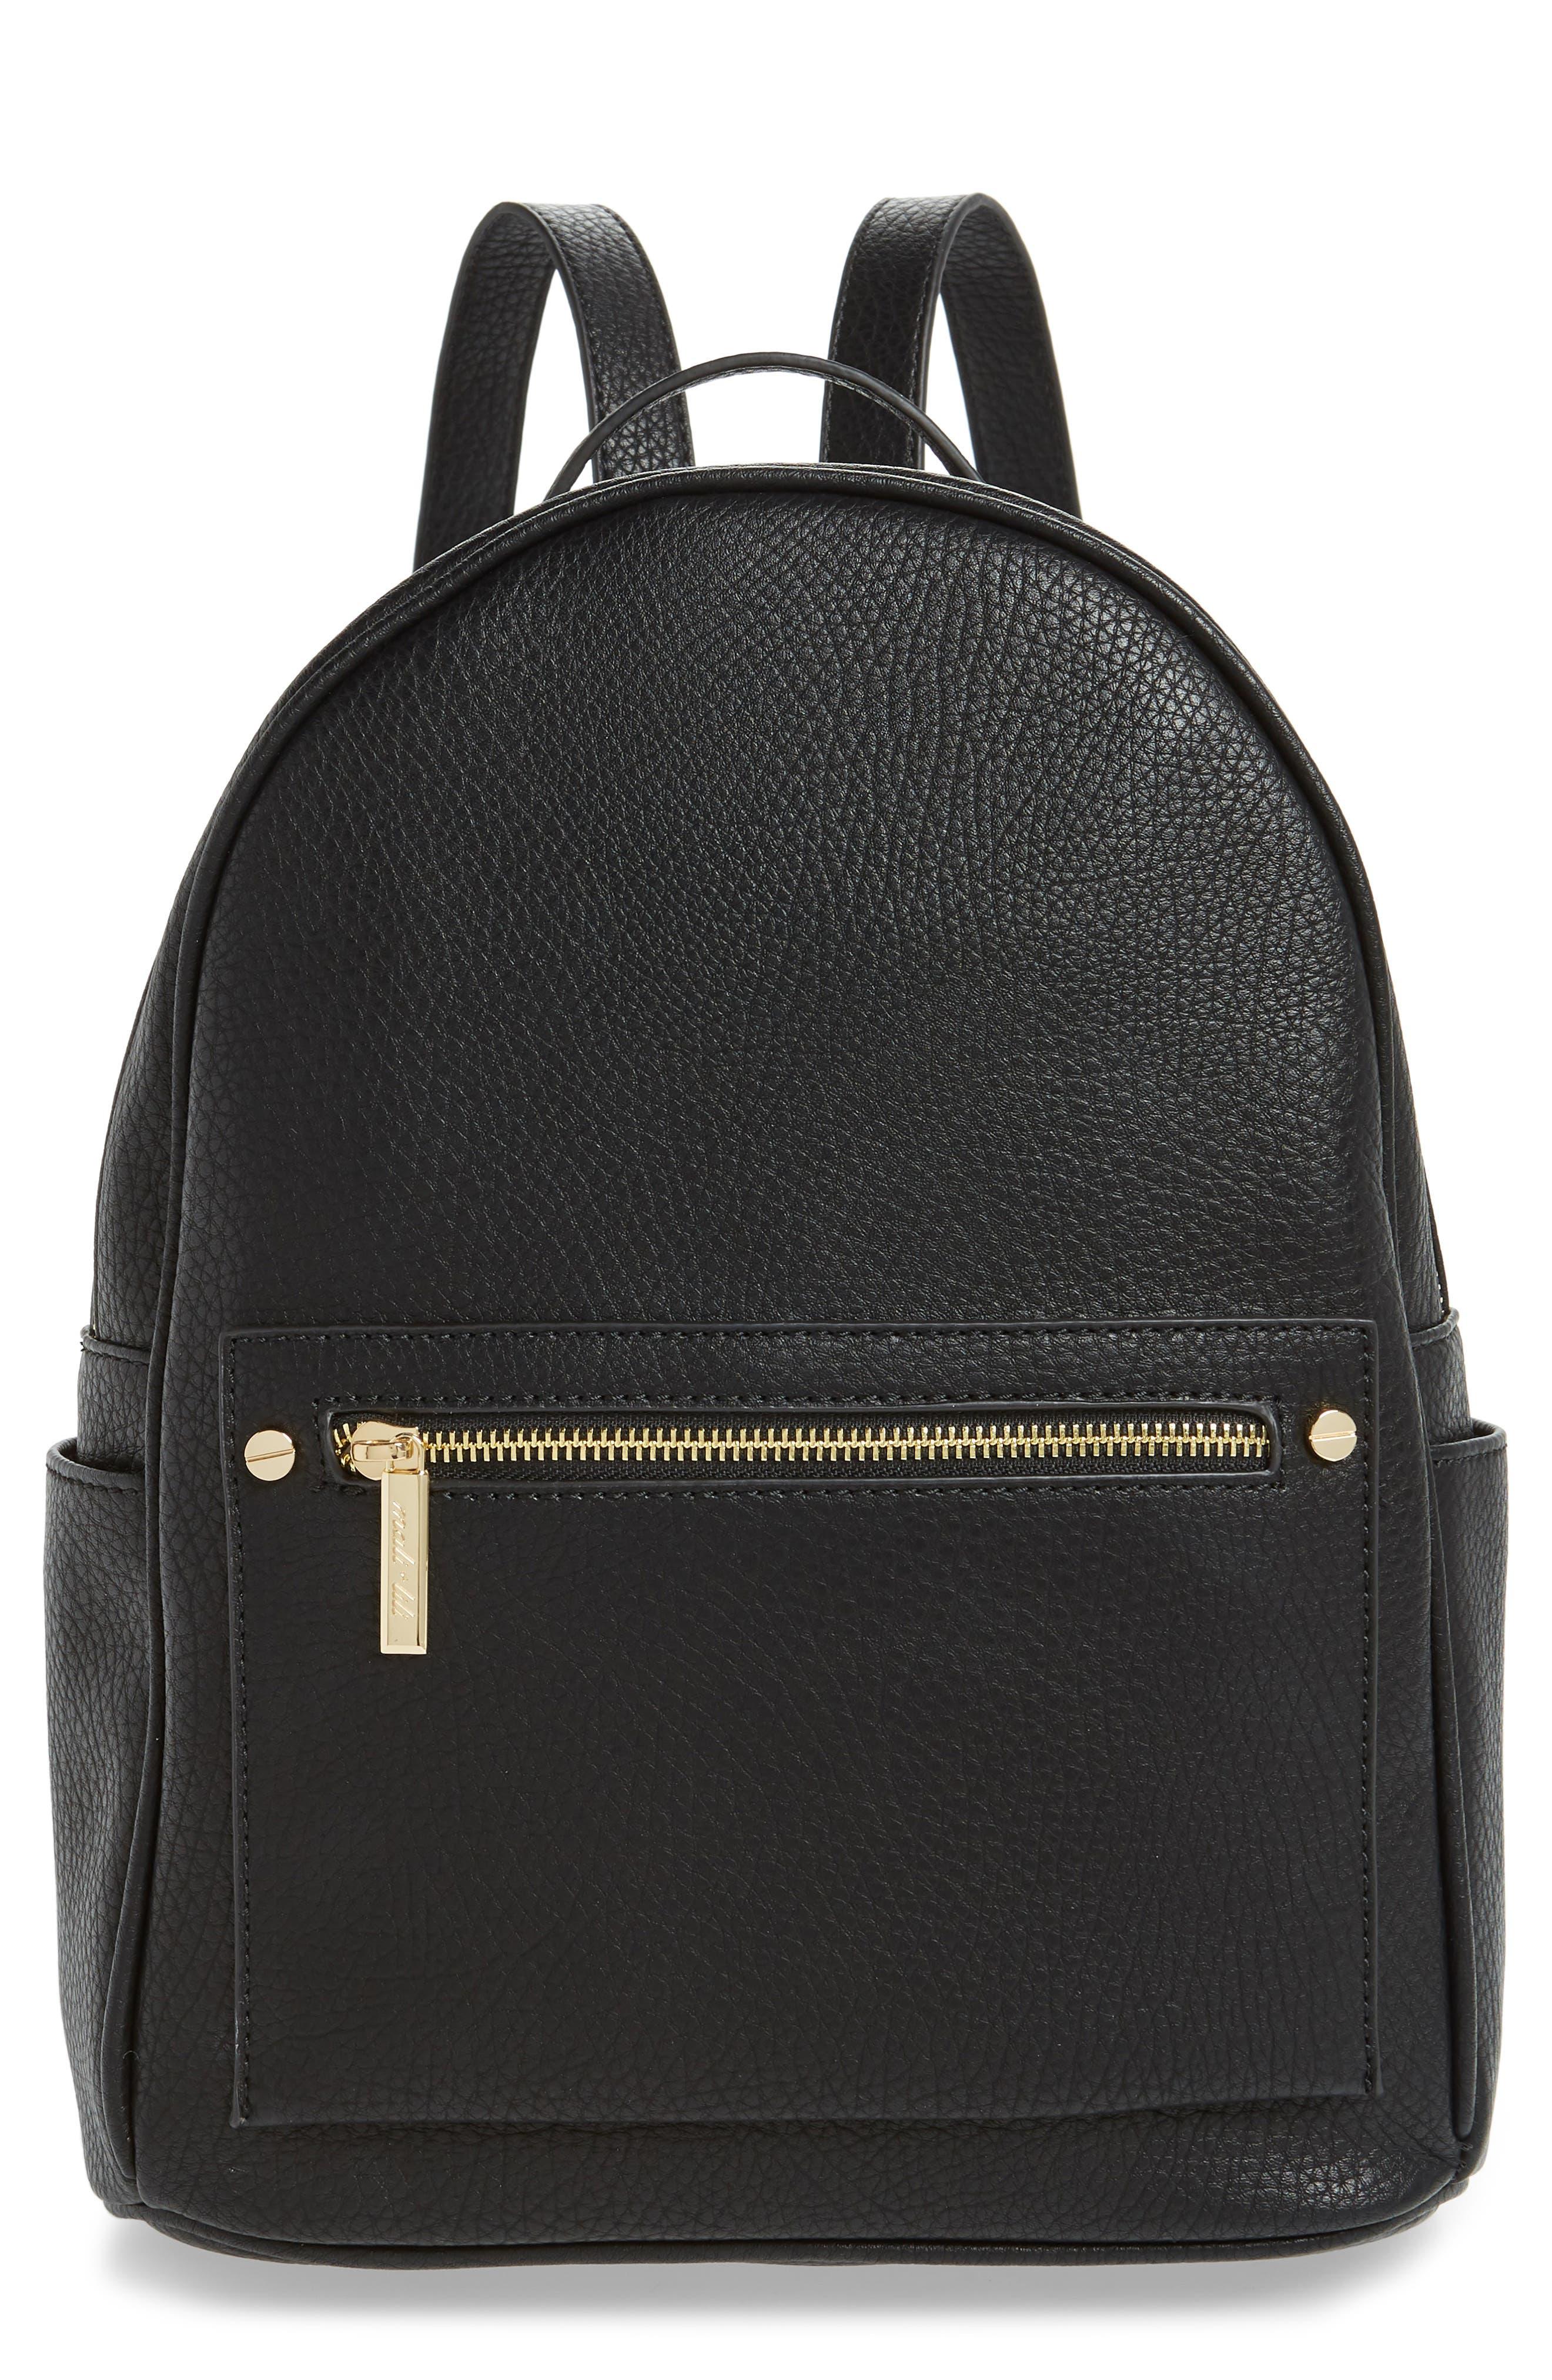 MALI + LILI,                             Addie Vegan Leather Backpack,                             Main thumbnail 1, color,                             BLACK